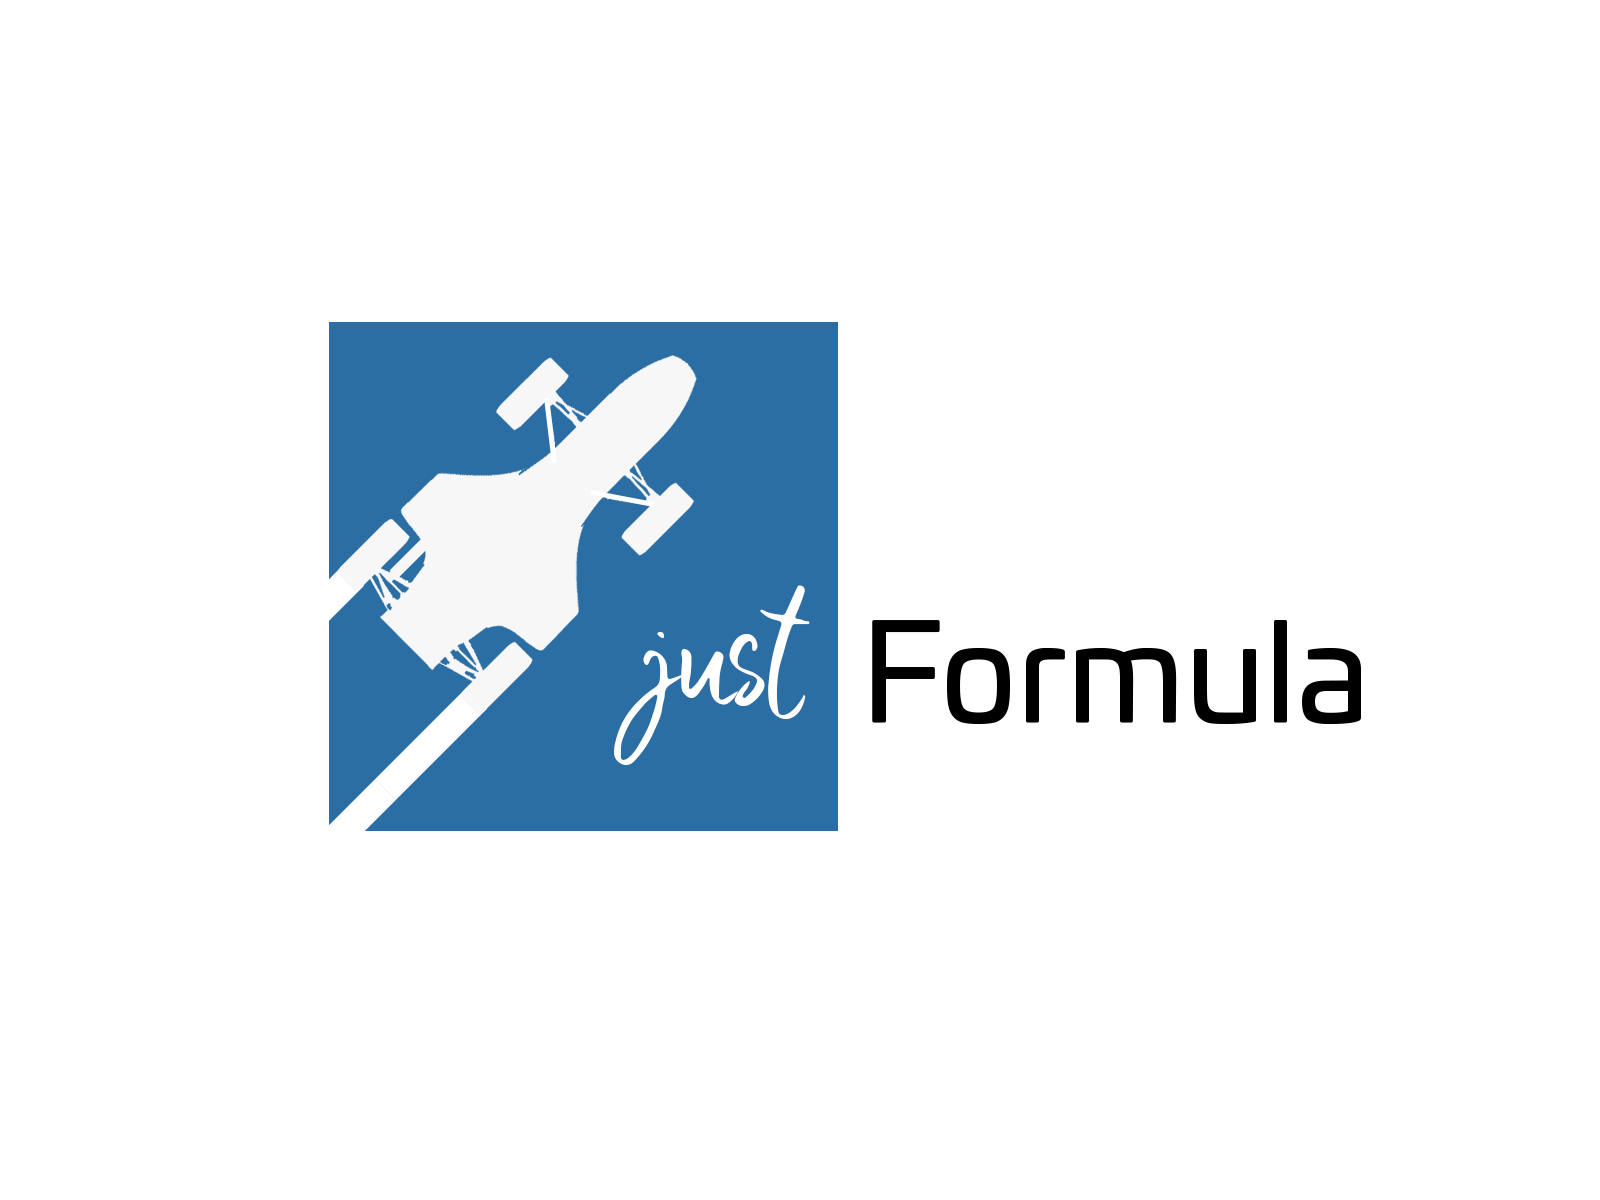 justFORMULA - Tudo sobre Fórmula SAE Brasil